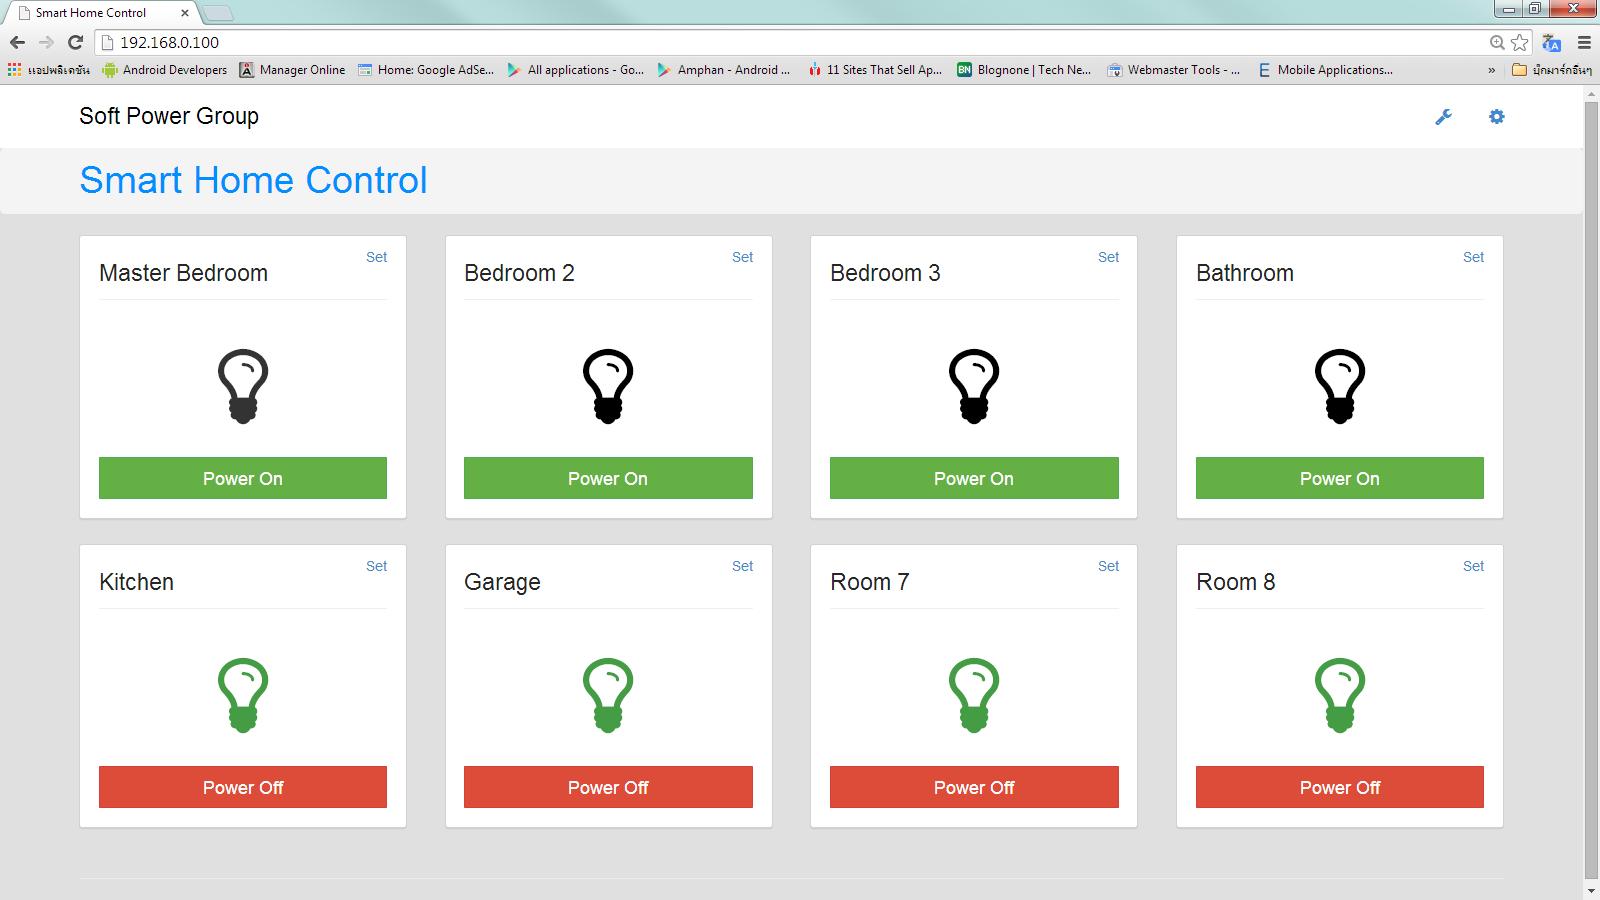 Raspberry Pi Smart Home Control ระบบควบค มบ านอ ฉร ยะ Iot Smart